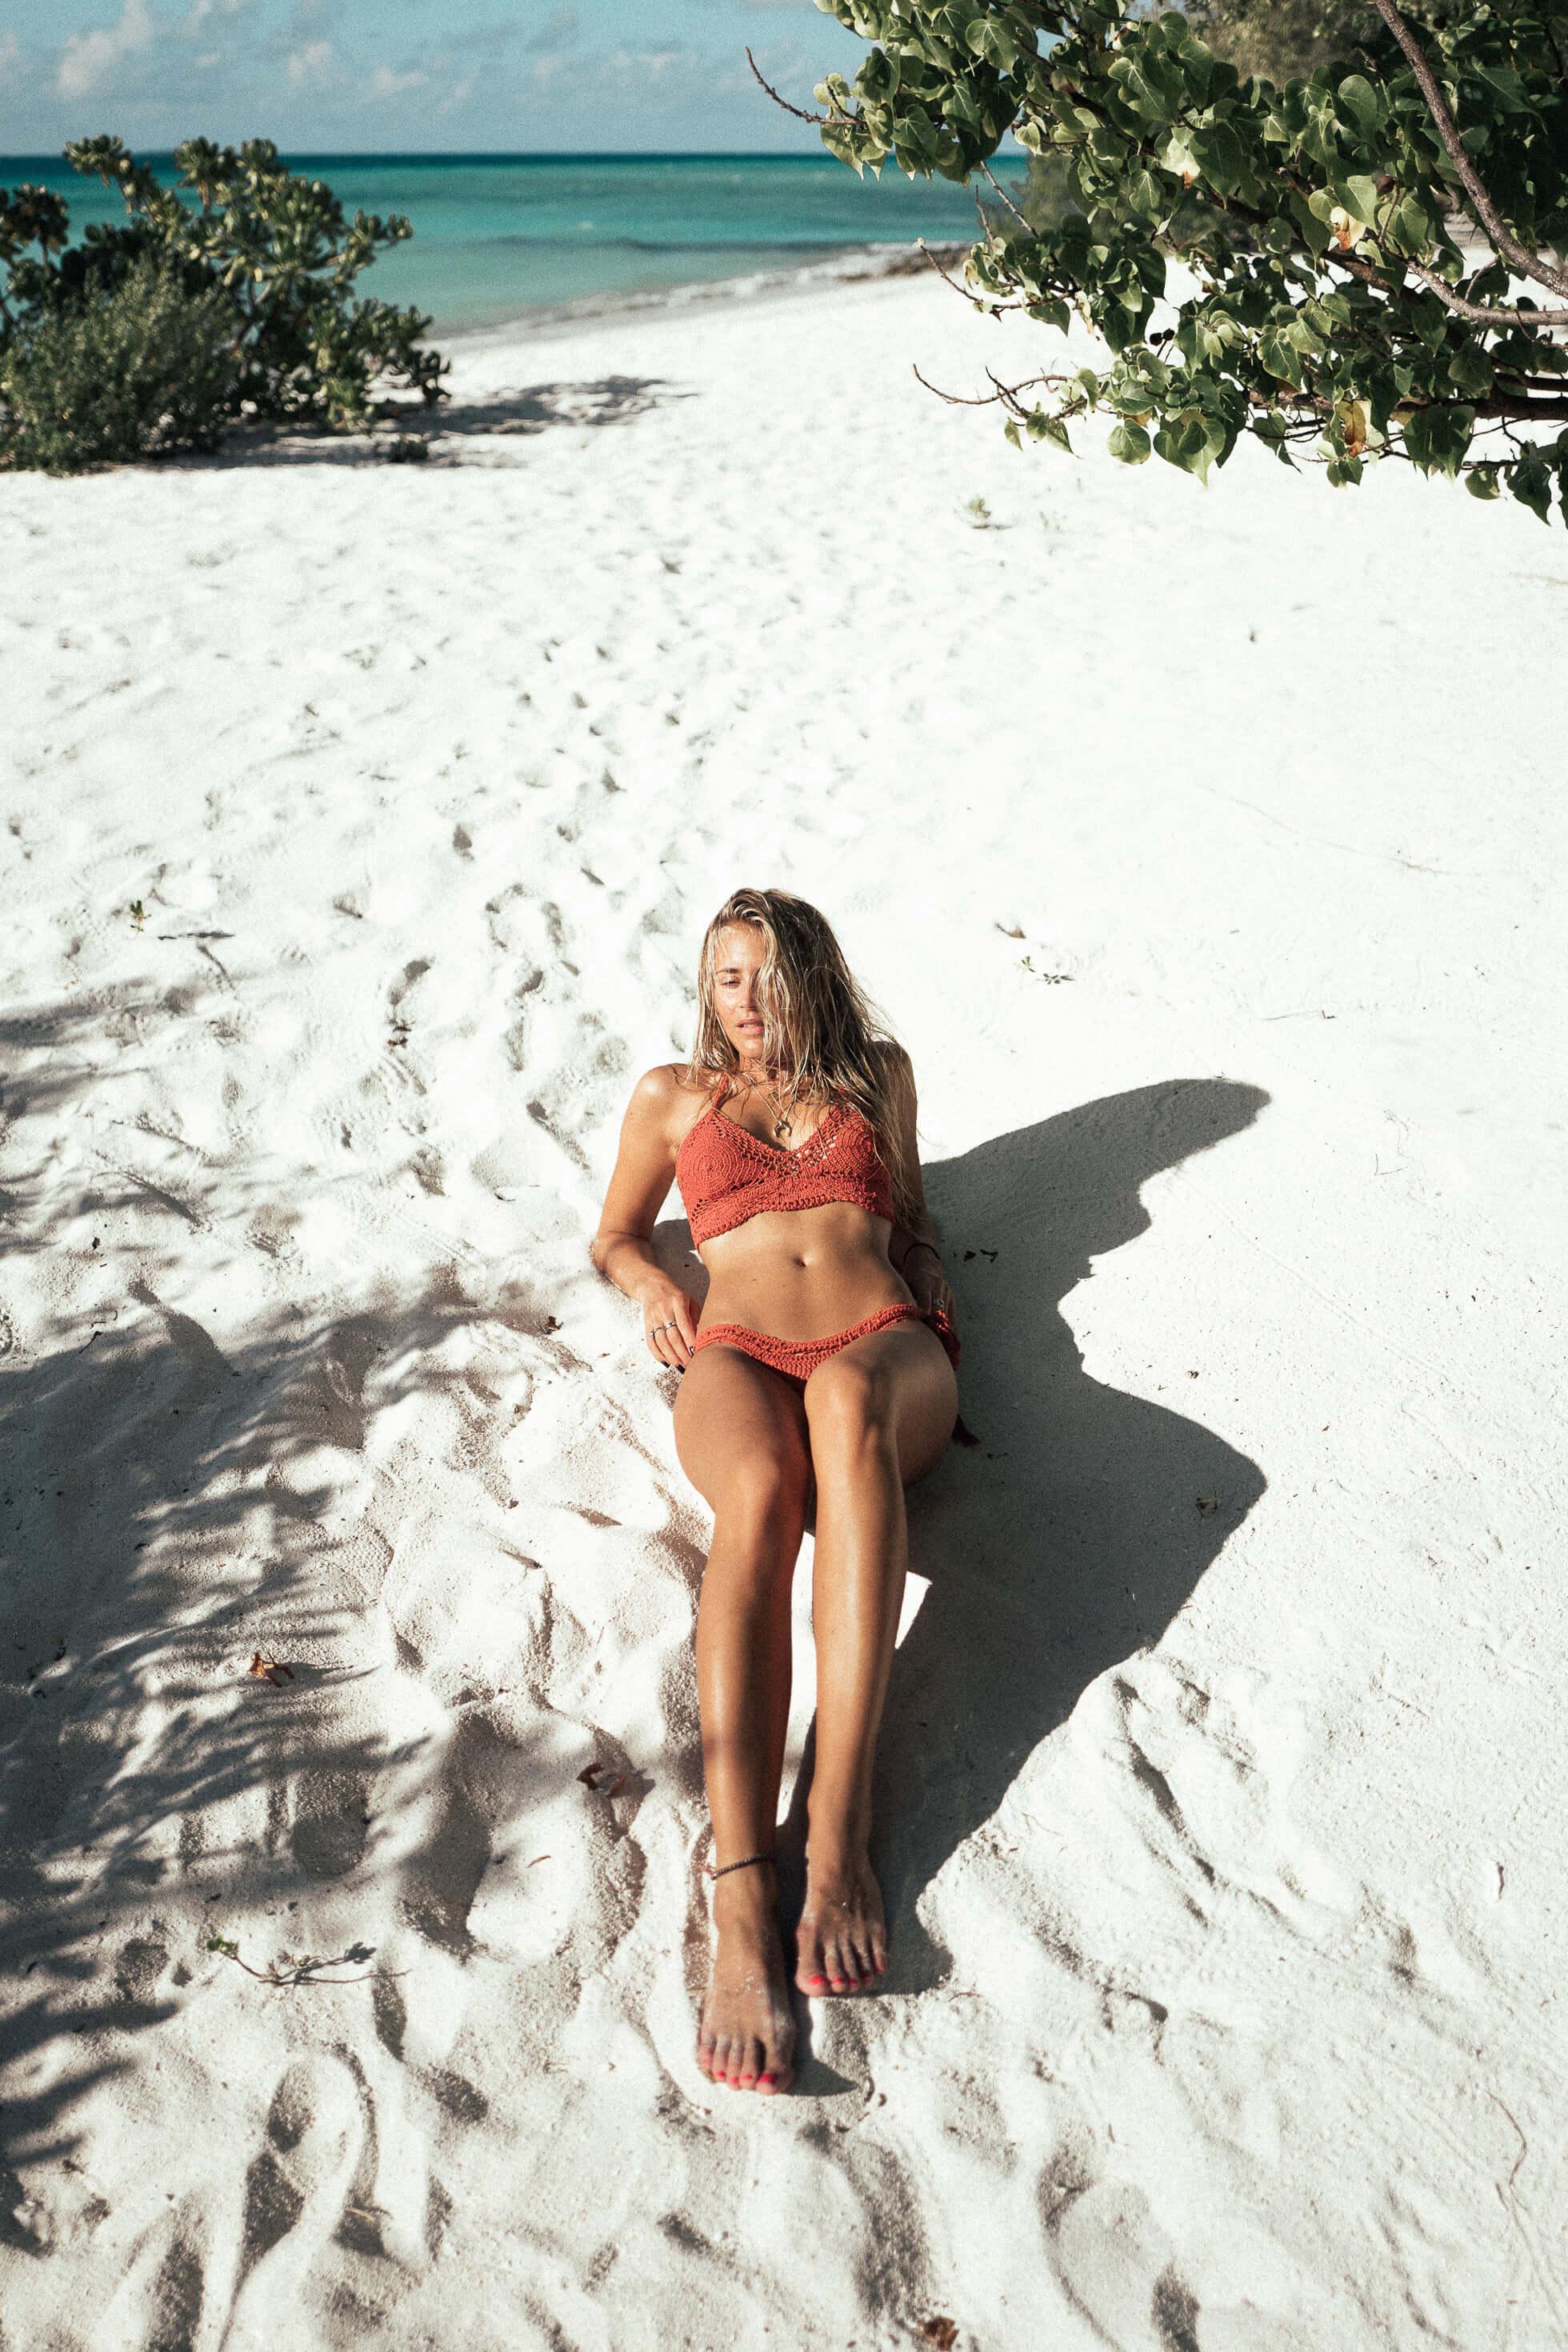 janni-deler-crochet-bikini-maldivesl1120673